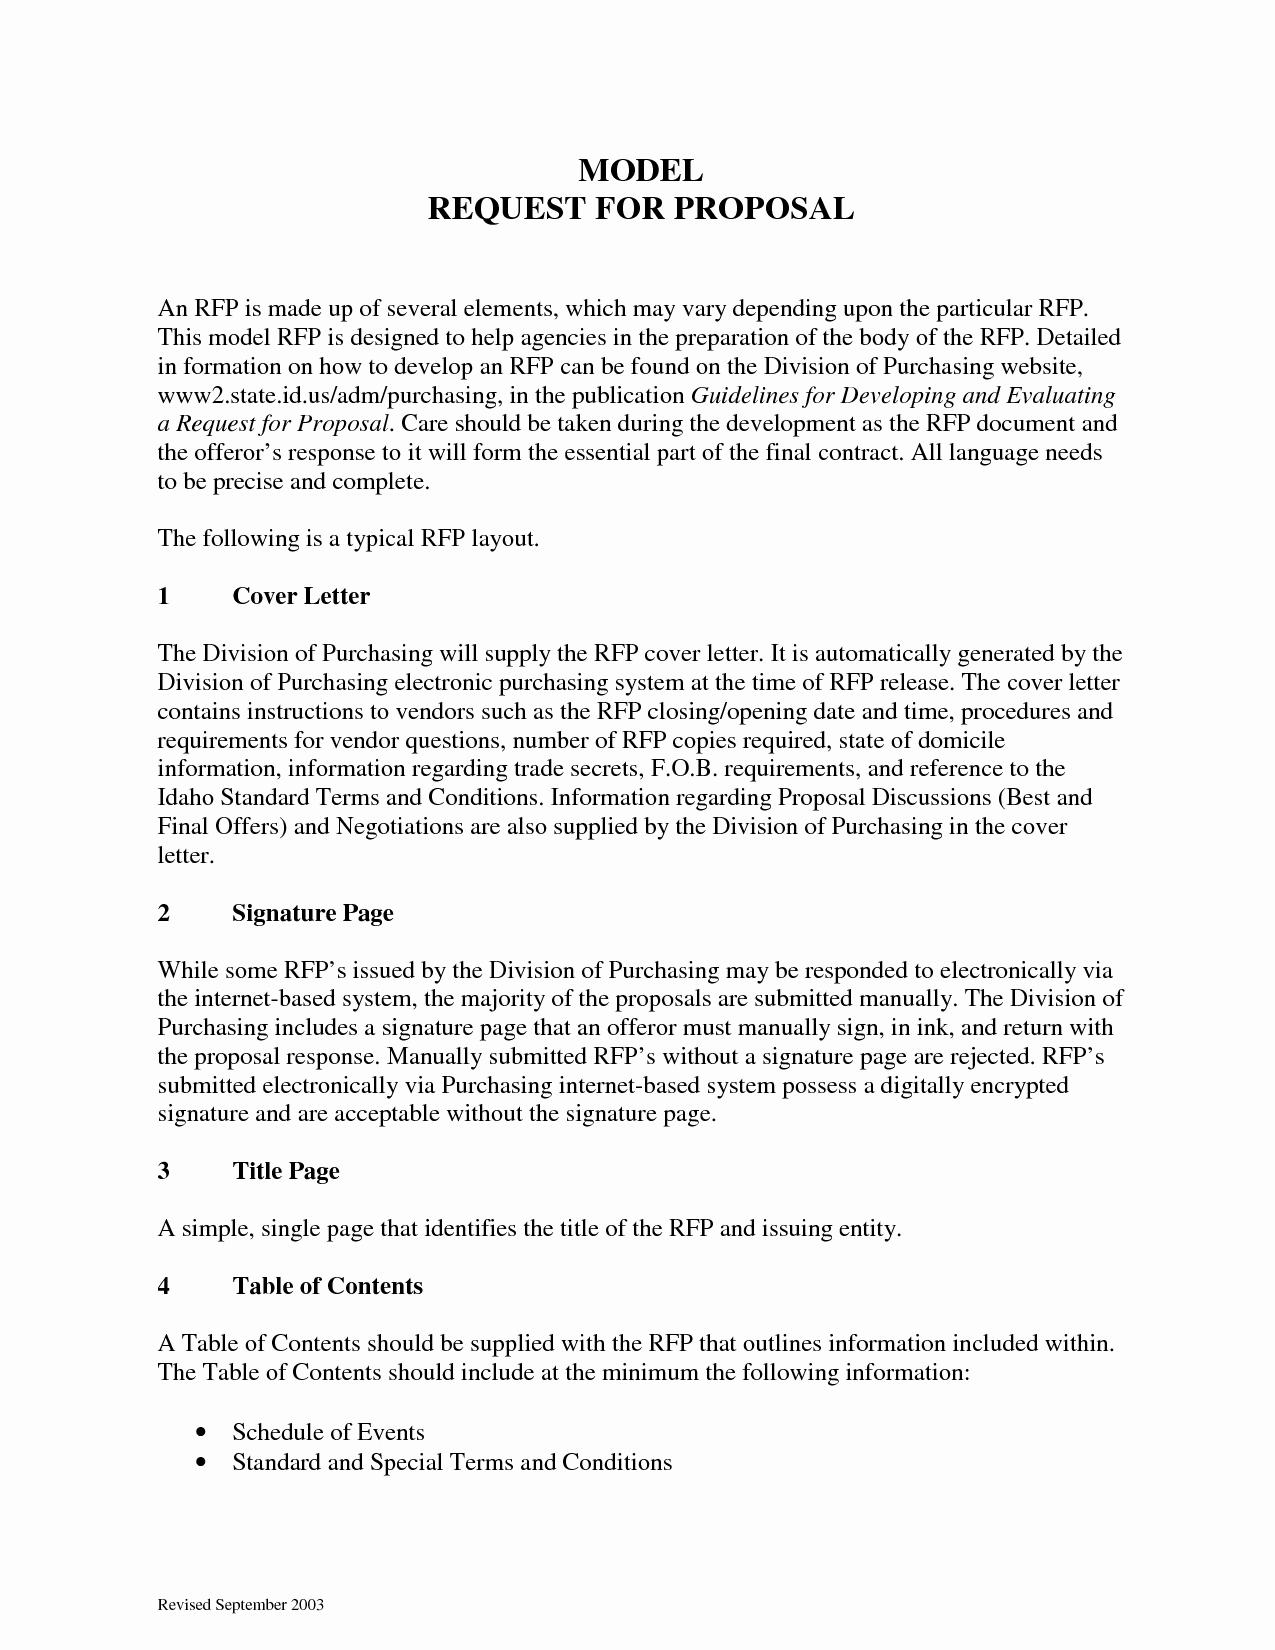 Simple Rfp Template Word New Simple Rfp Template Word Portablegasgrillweber